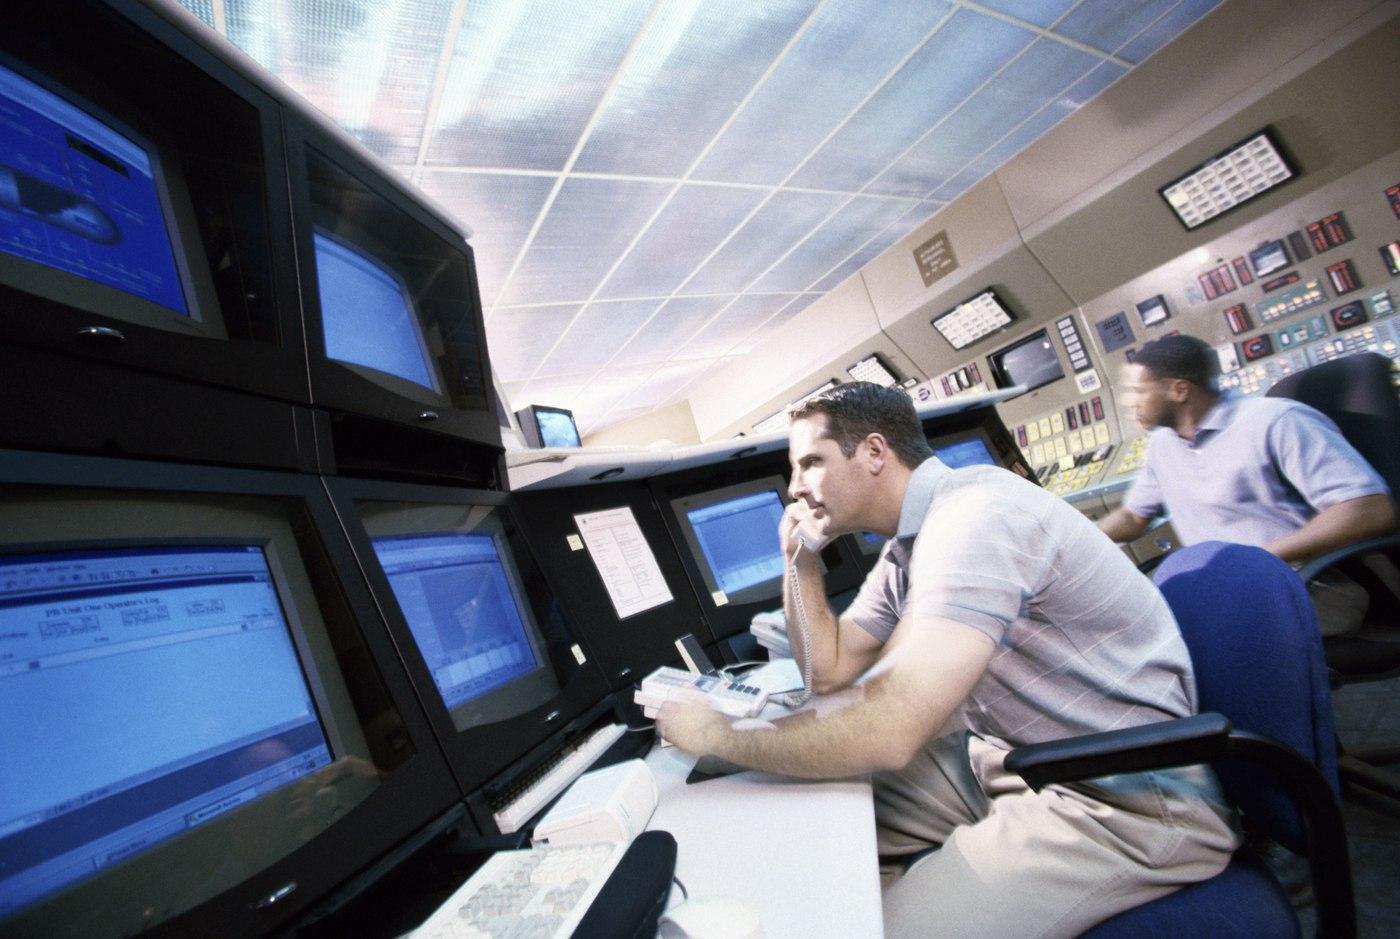 0% Cybersecurity Job Unemployment in Washington